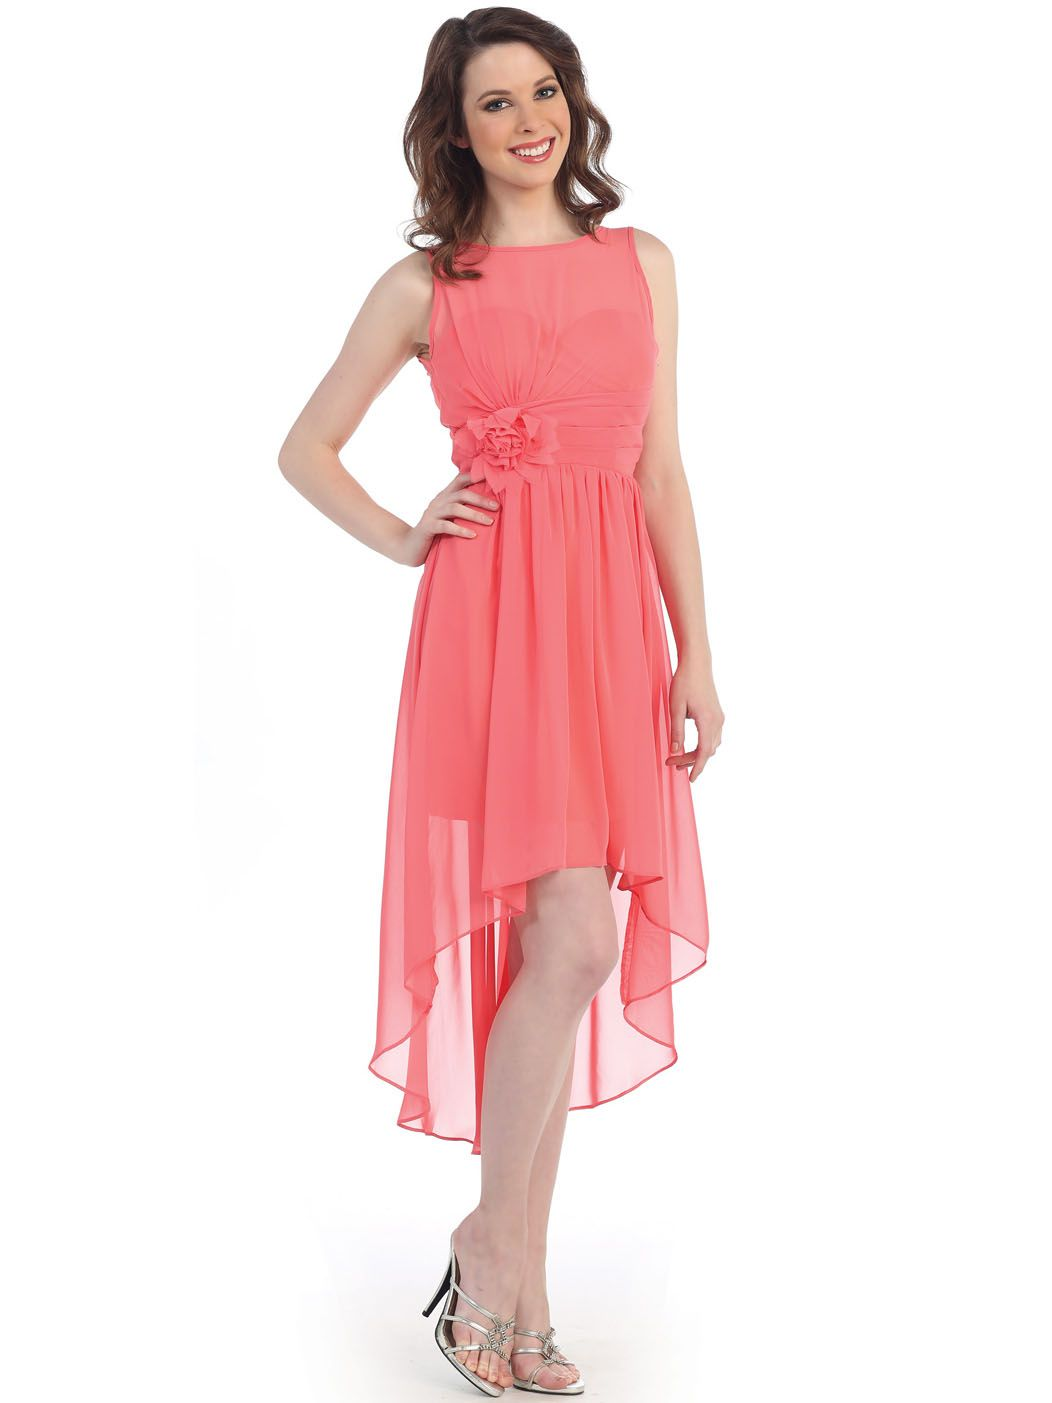 ebd1e5c9bd CN1381 Chiffon High Low Cocktail Dress - Coral